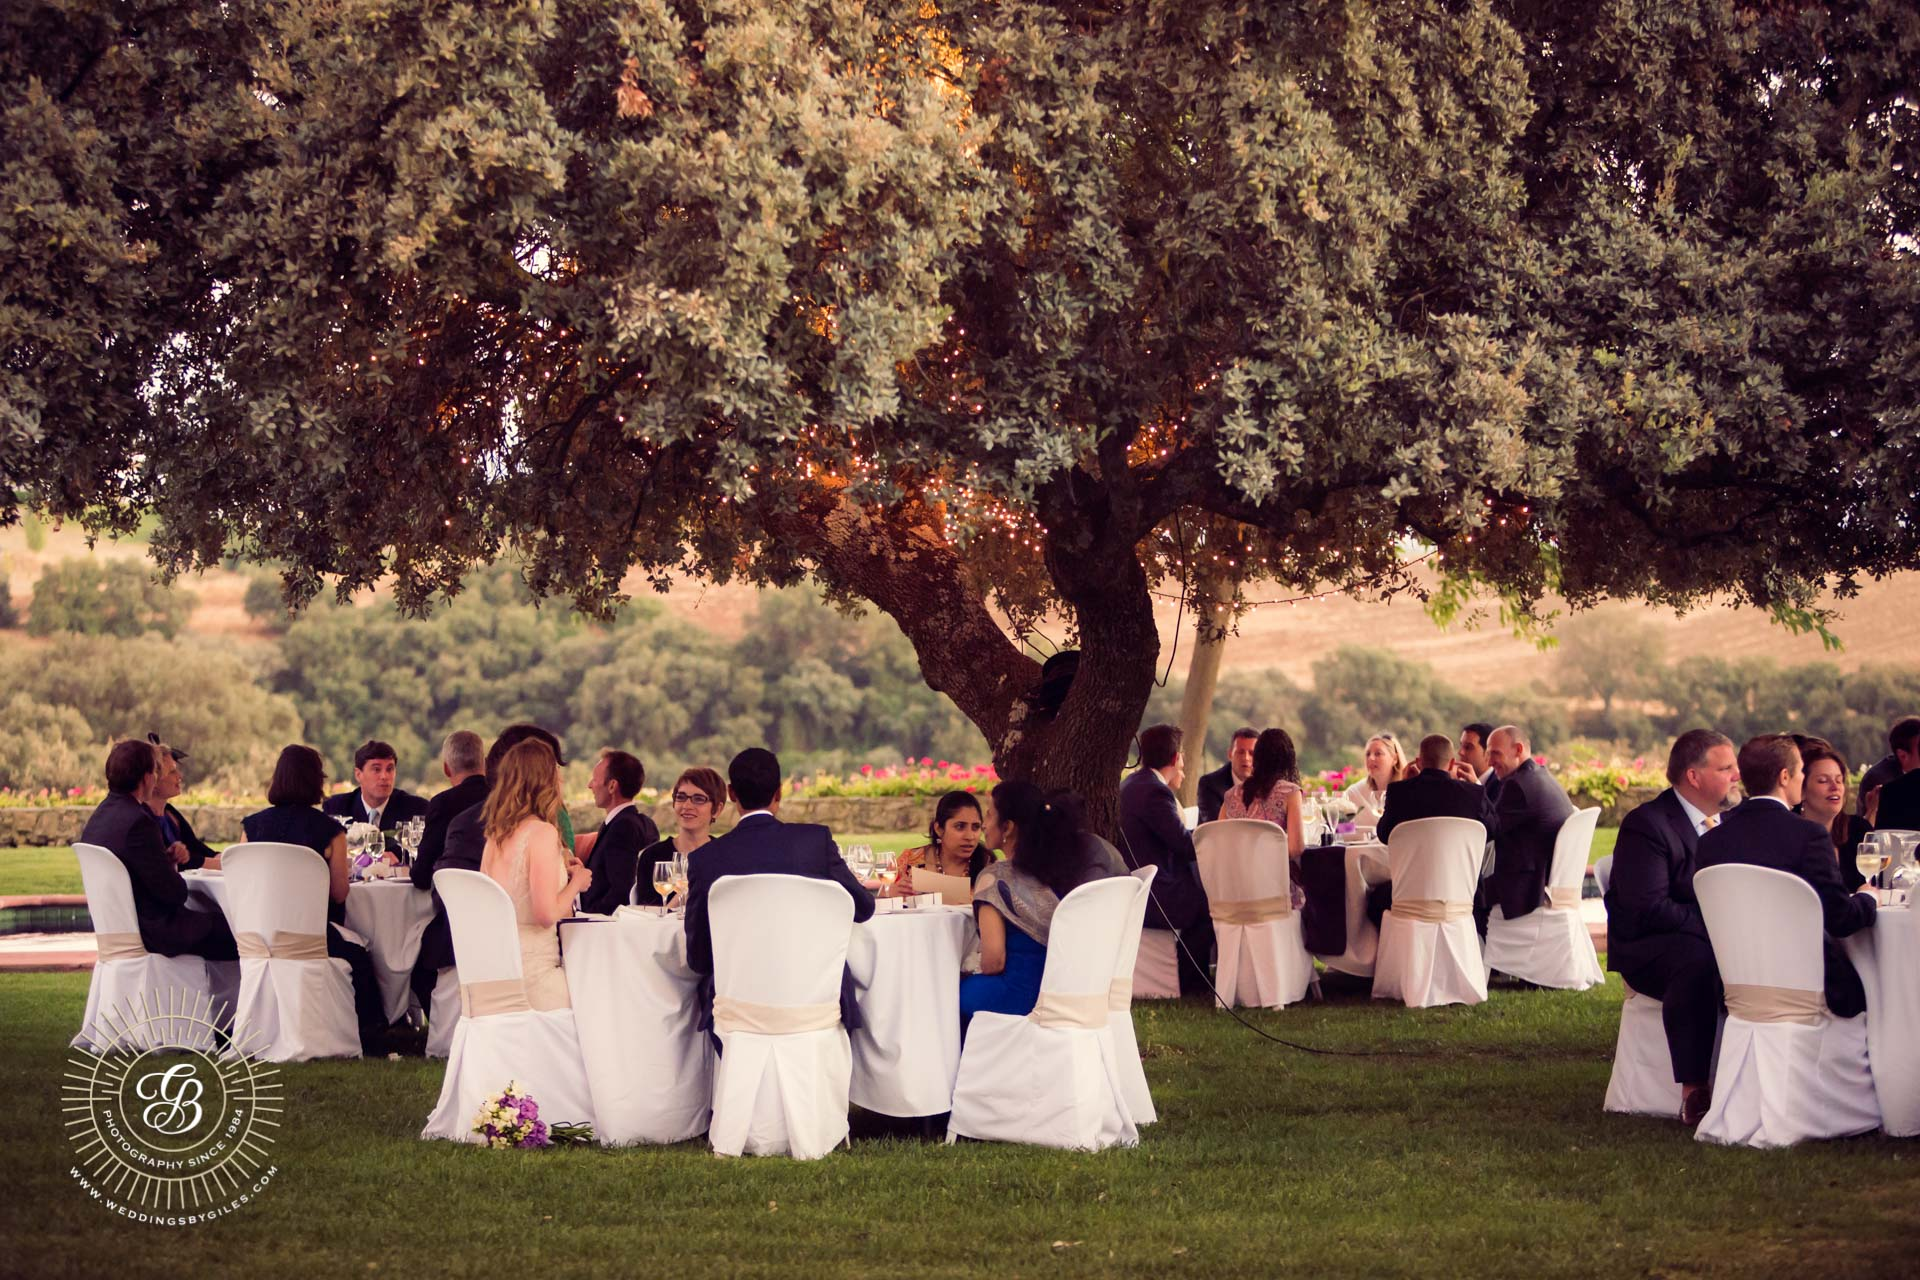 wedding dinner under a tree in spain